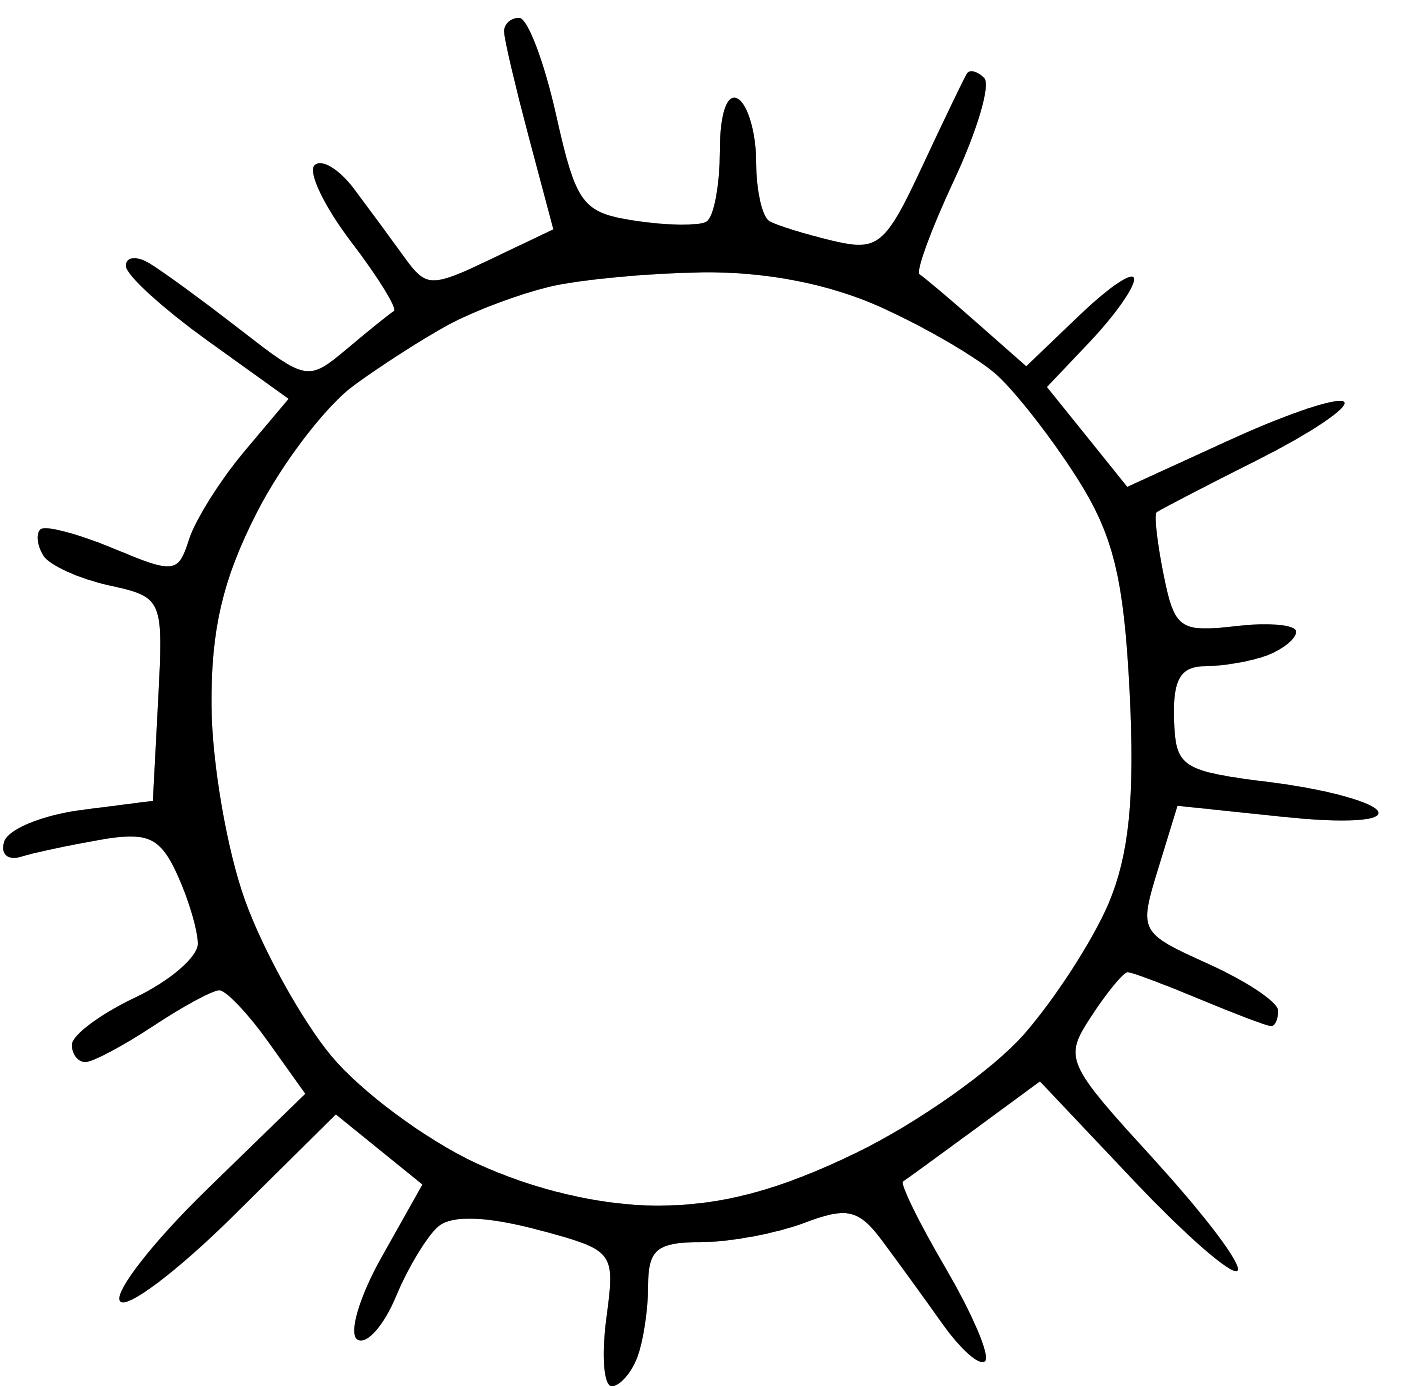 Lds clipart sun. Panda free images